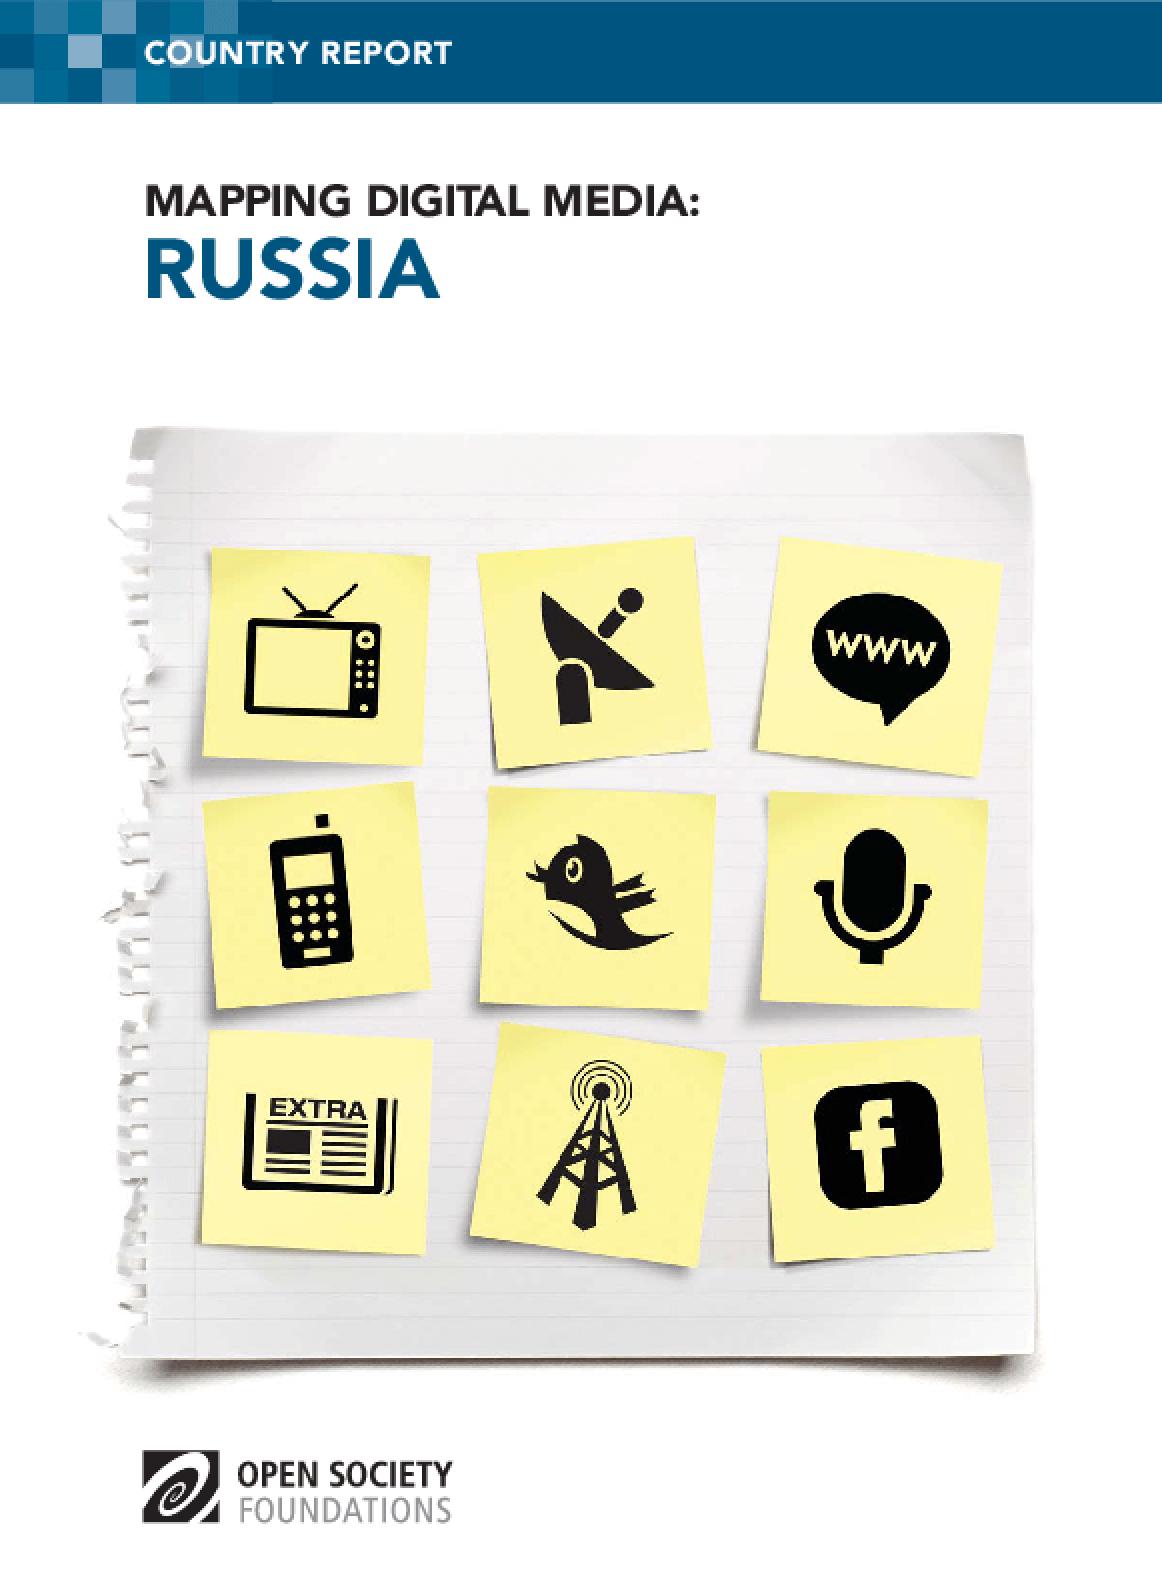 Mapping Digital Media: Russia